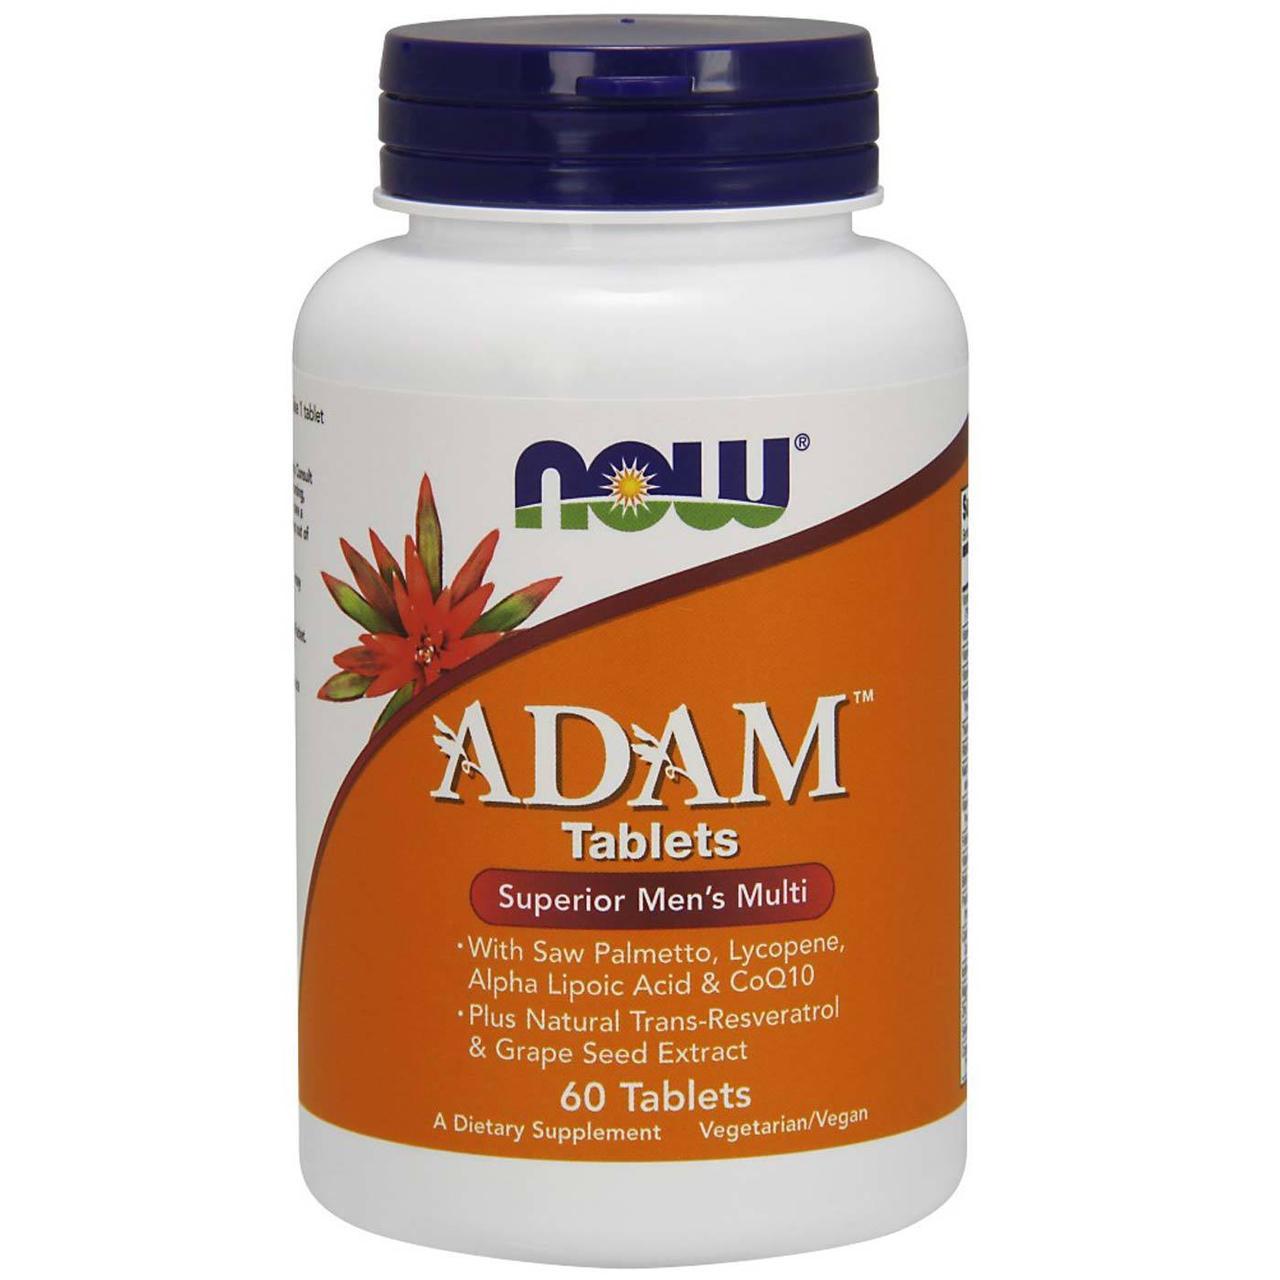 Супер Мультивитамины для Мужчин, Adam, Now Foods, 60 таблеток